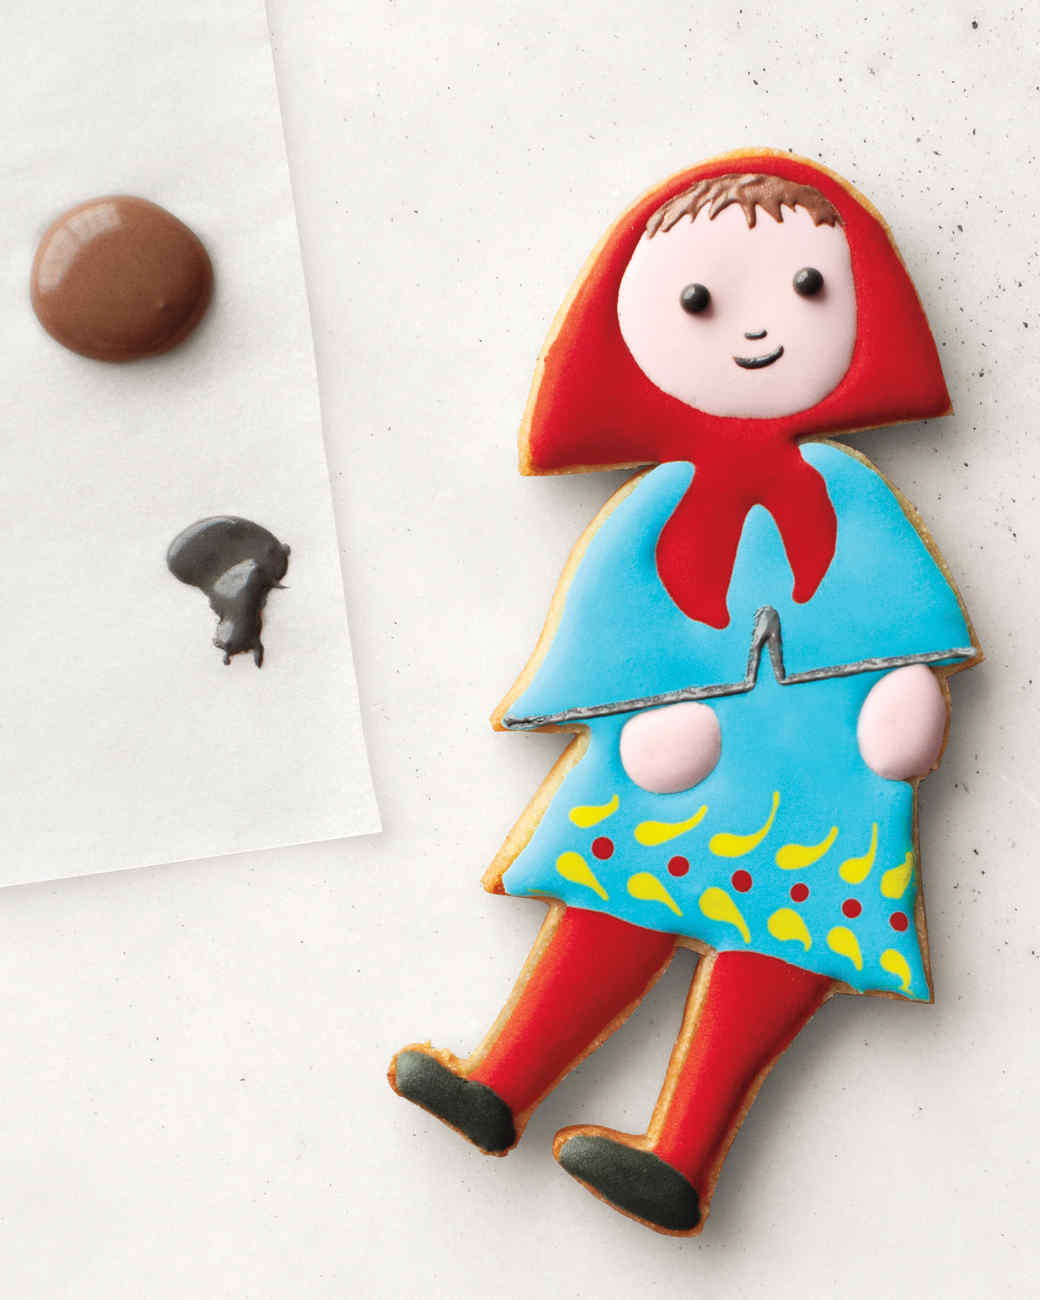 Sugar-Cookie Cutouts